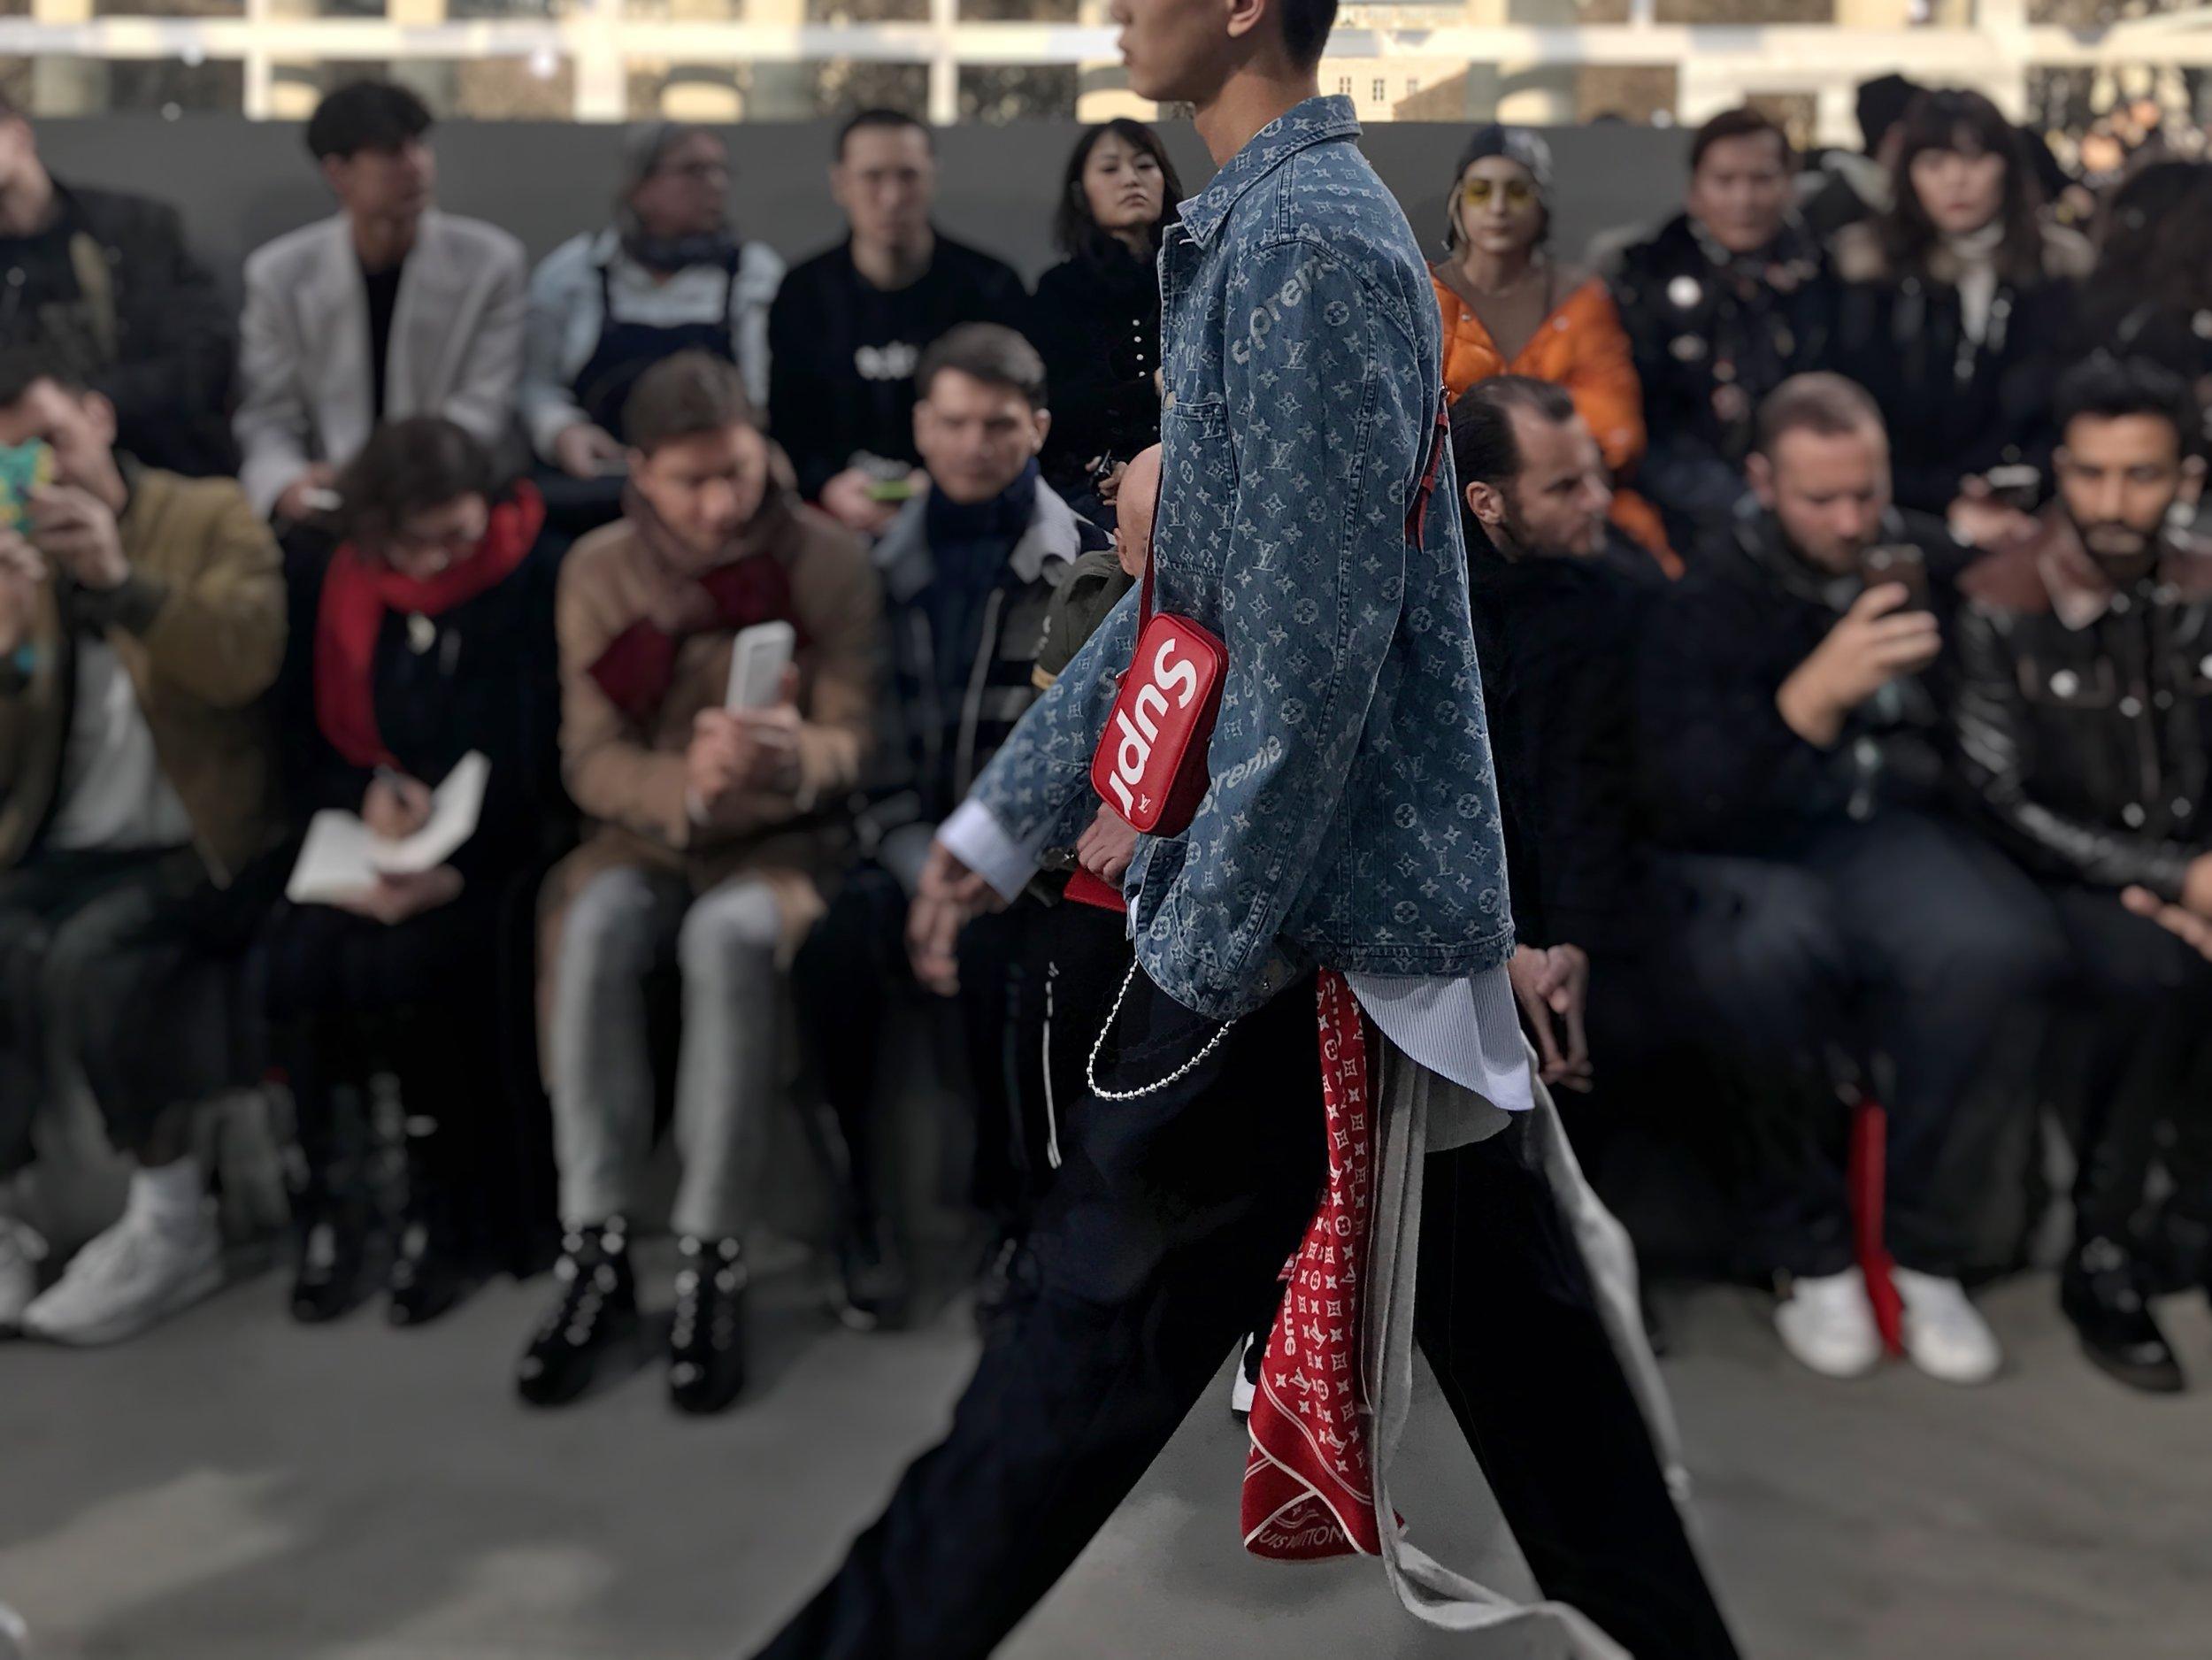 #C1PICK denim jacket, body bag and scarf